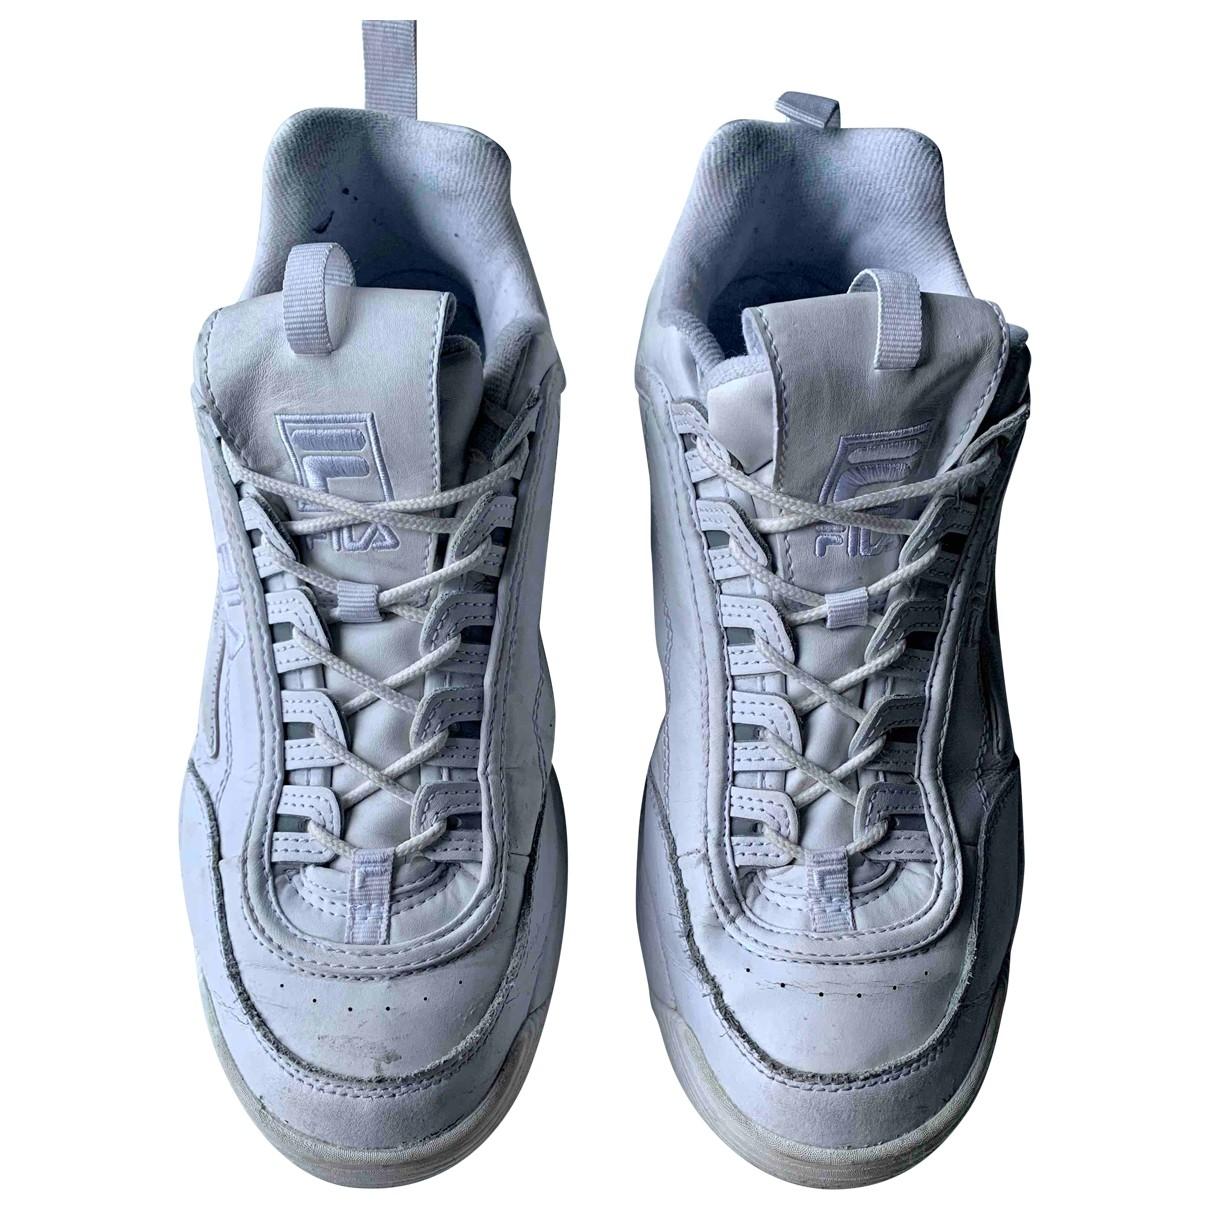 Fila \N Sneakers in  Weiss Polyester